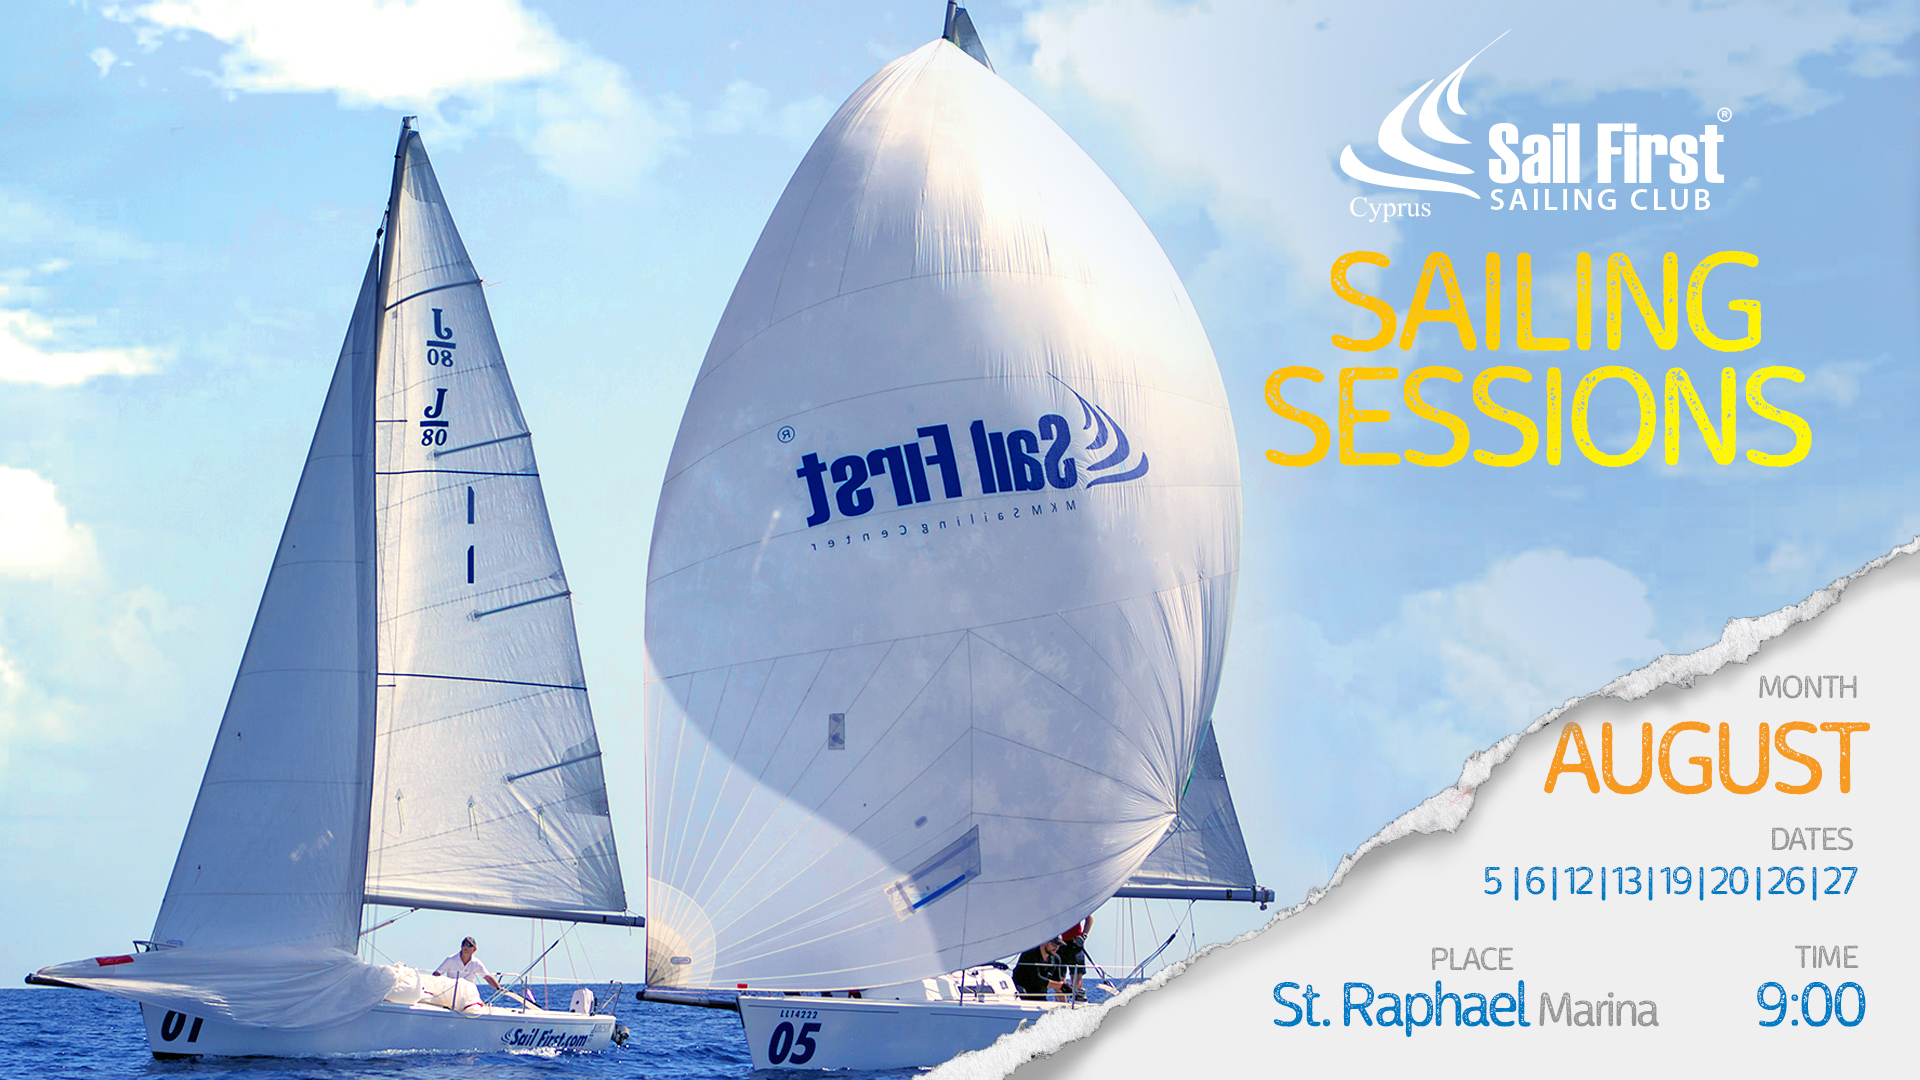 SailFirst J80 Sailing Sessions Cyprus